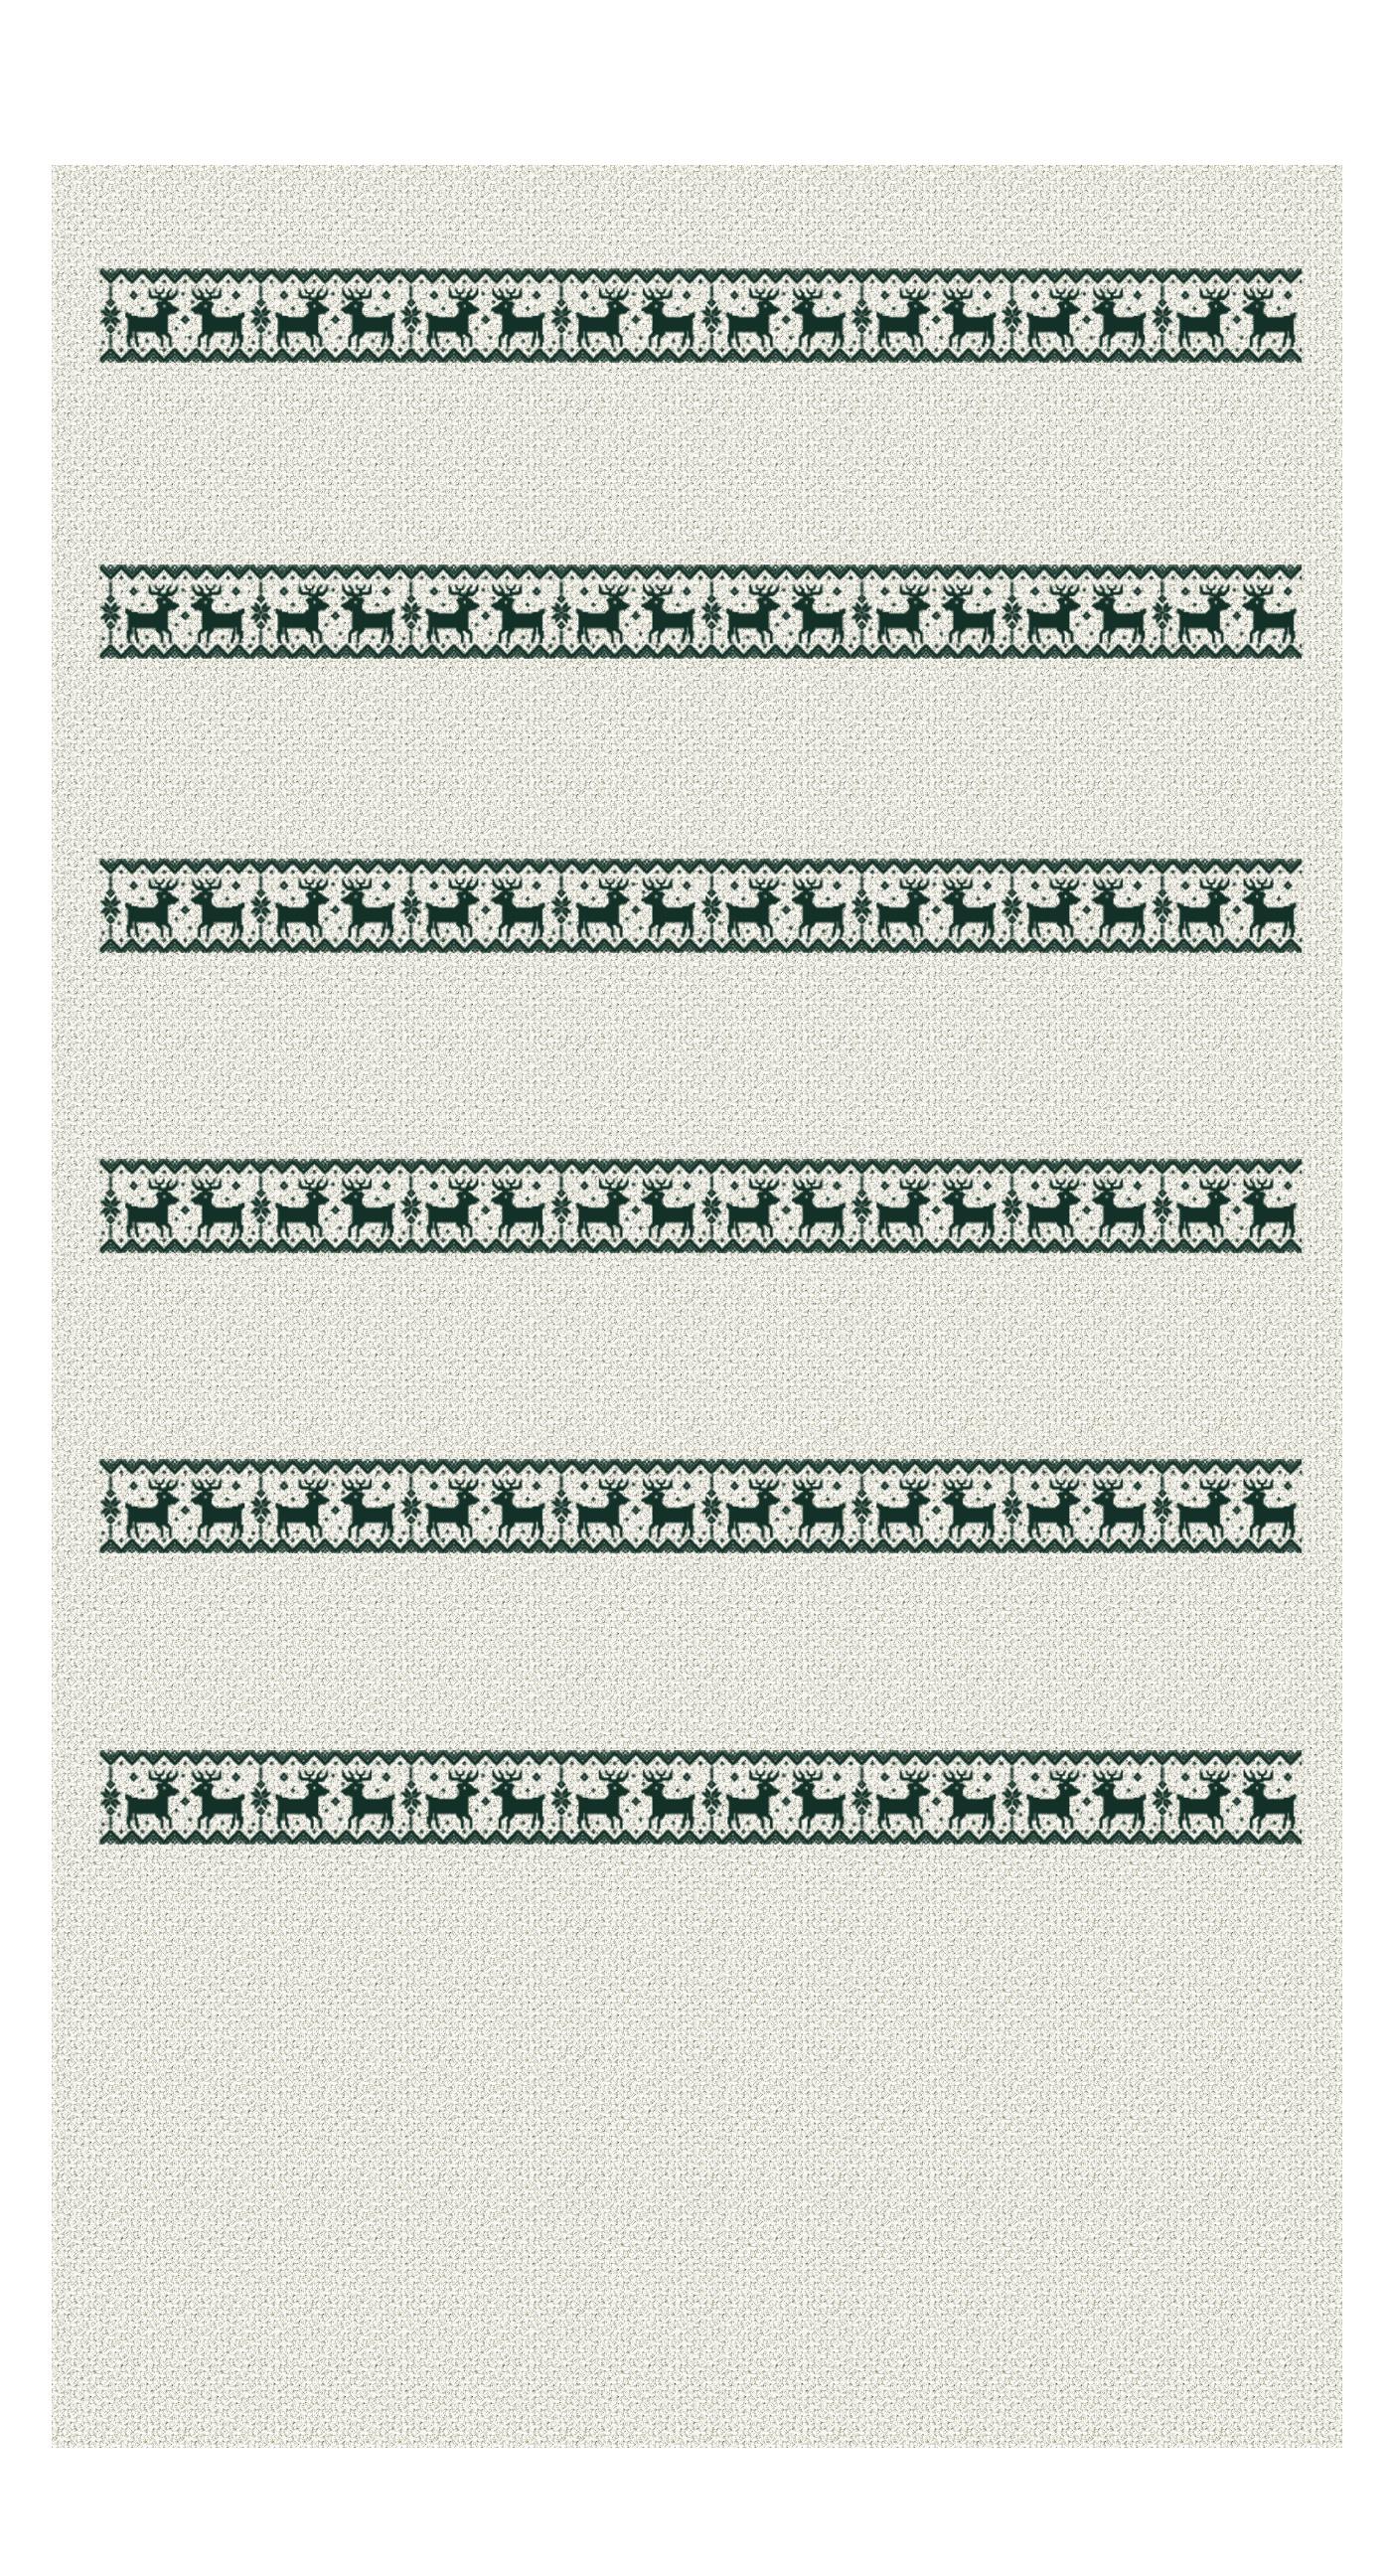 Shelf Christmas black reindeer | wallpaper.sc iPhone6sPlus